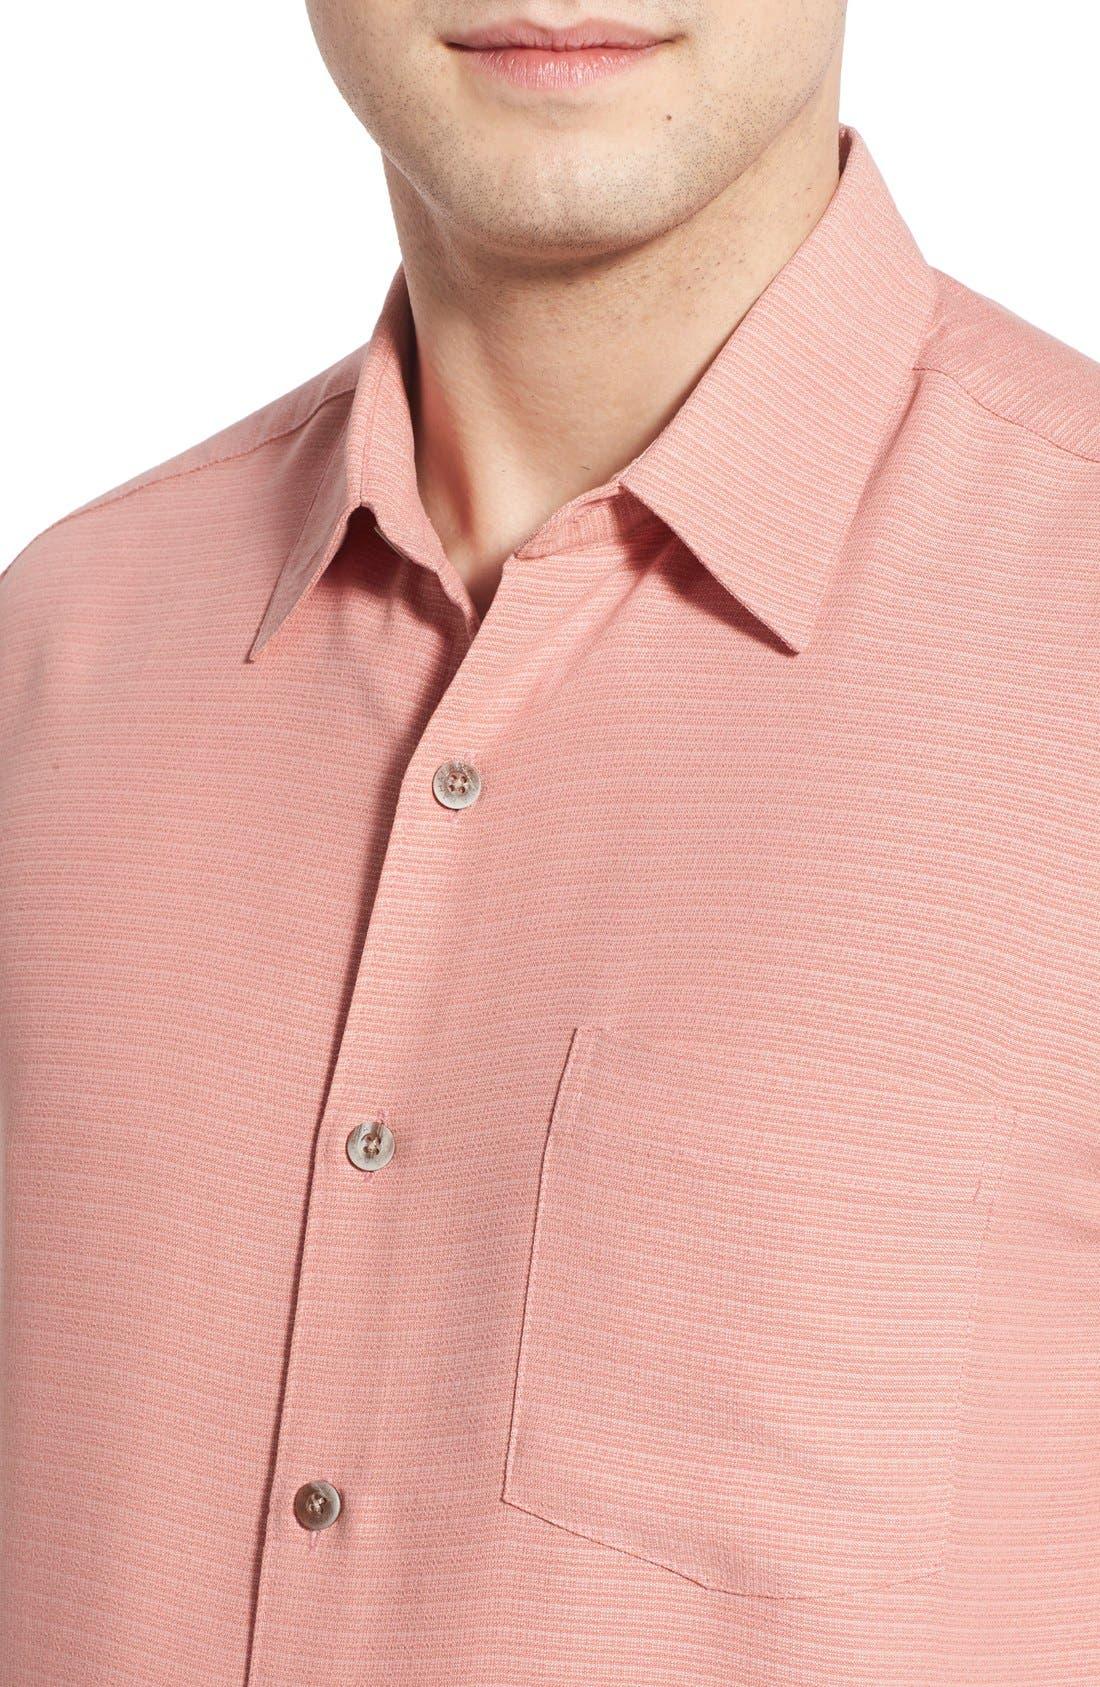 'Wind N Sea' Regular Fit Sport Shirt,                             Alternate thumbnail 14, color,